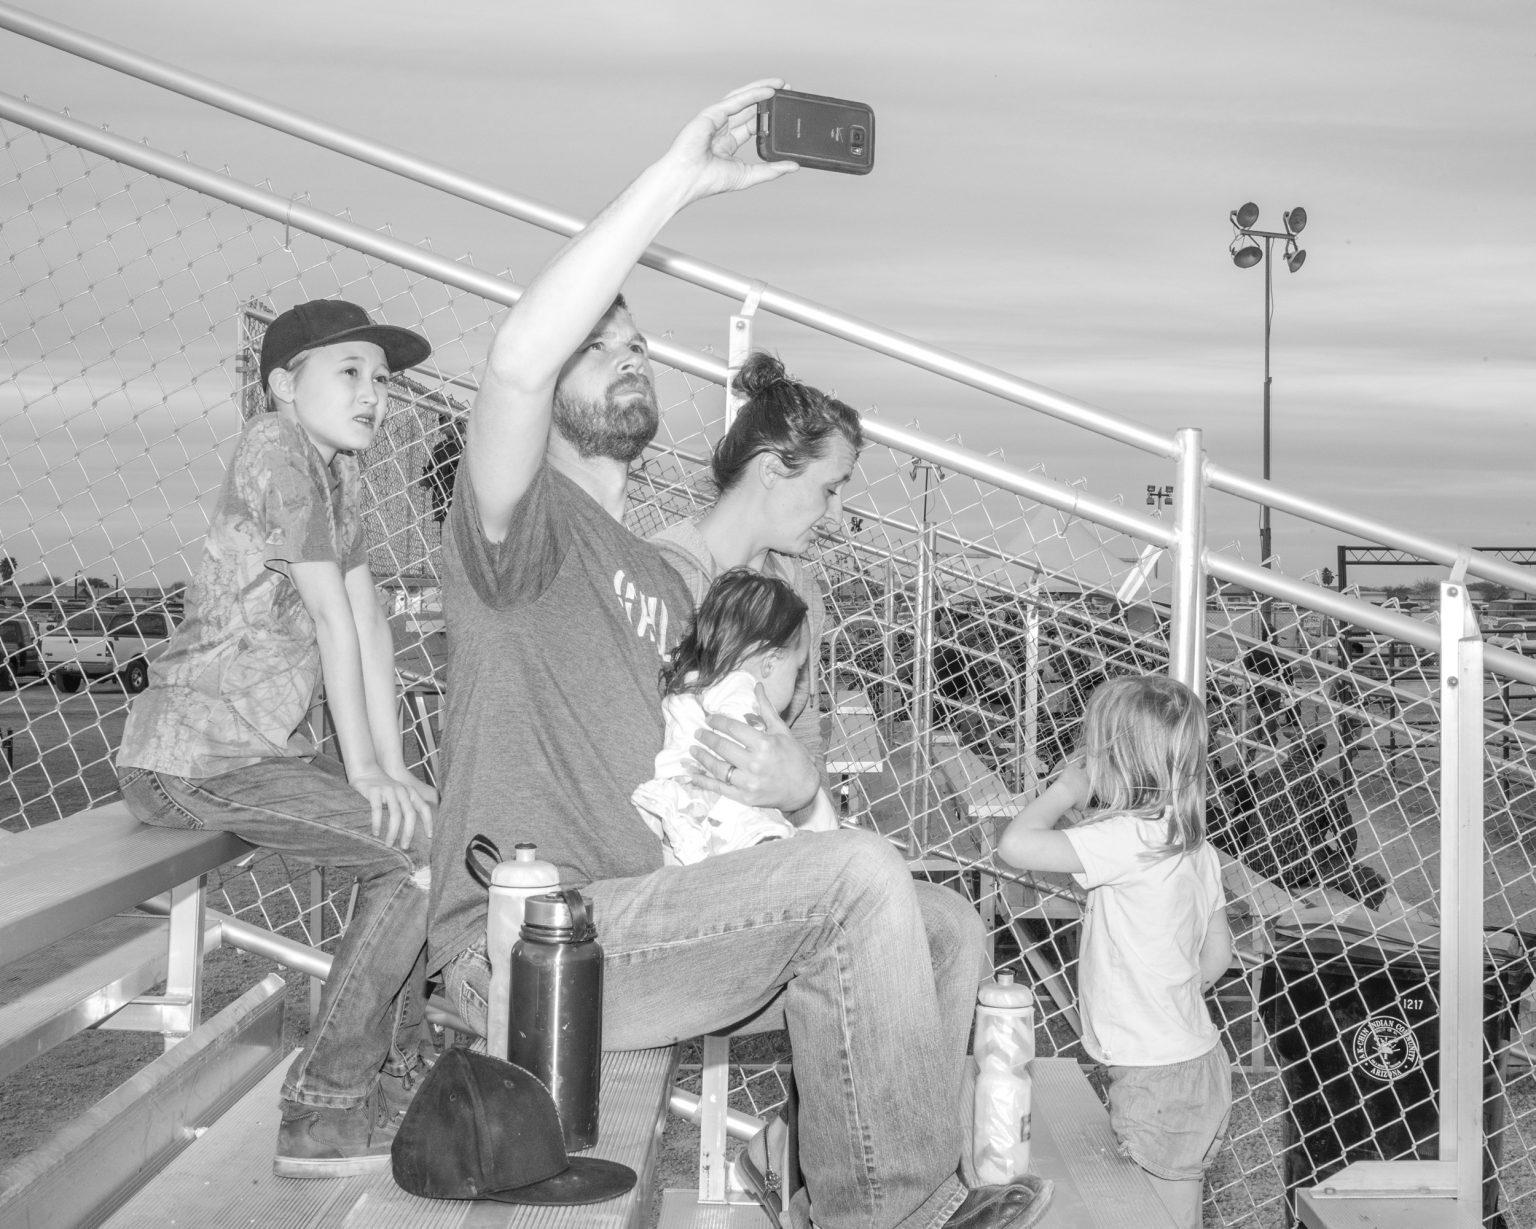 A family at a Native celebrations rodeo in Maricopa, Arizona. December 2017.